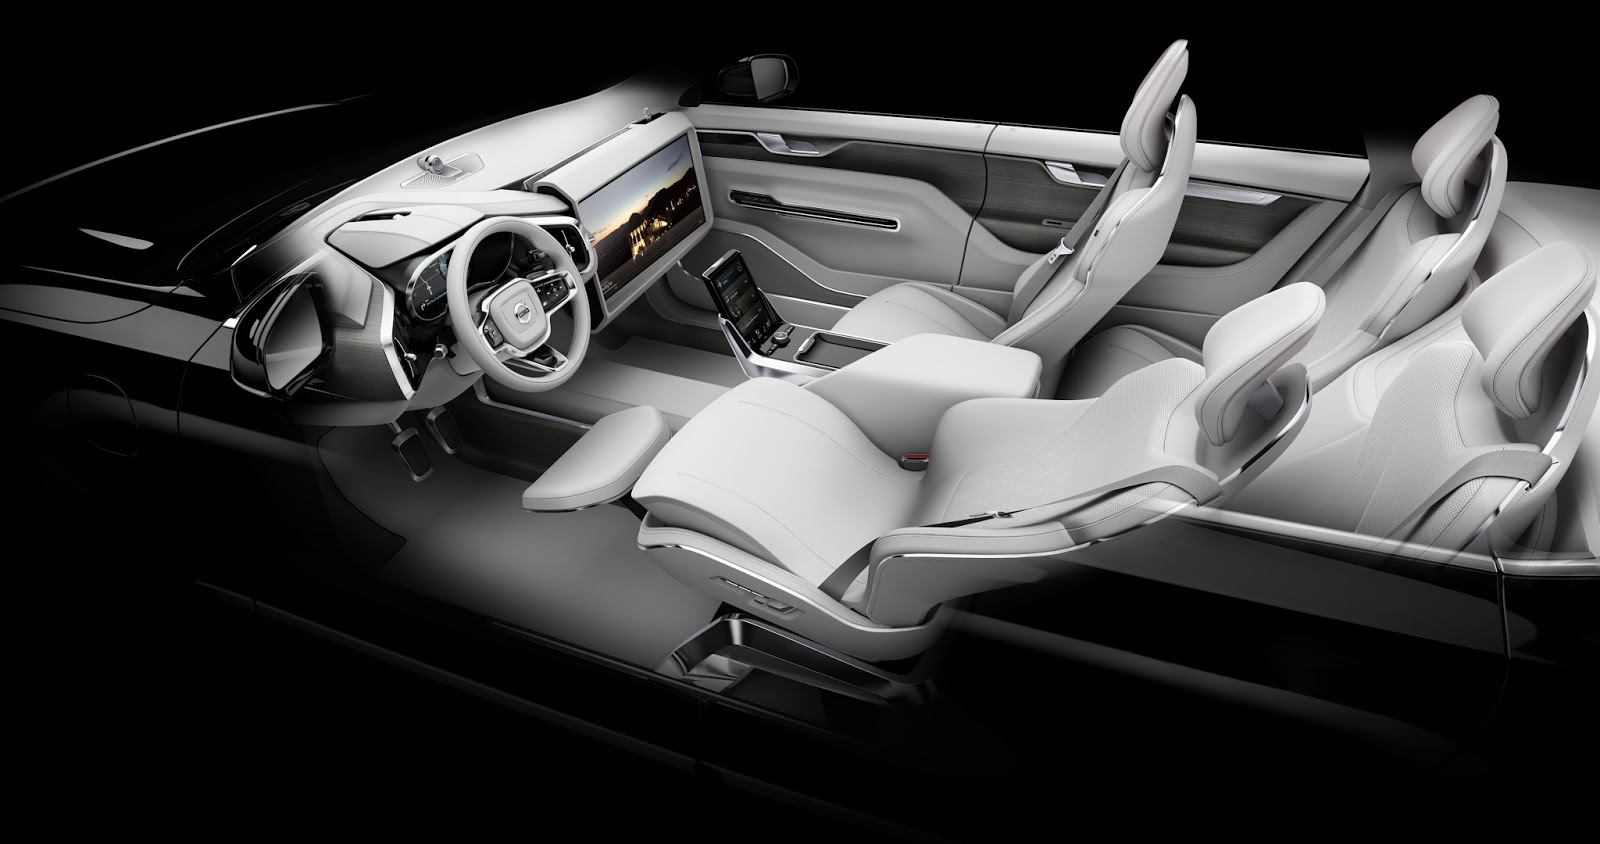 169543 Concept 26 Η Volvo θα κάνει και την αυτόνομη οδήγηση διασκεδαστική Autonomous Driving, Volvo, Volvo XC90, Αυτόνομη οδήγηση